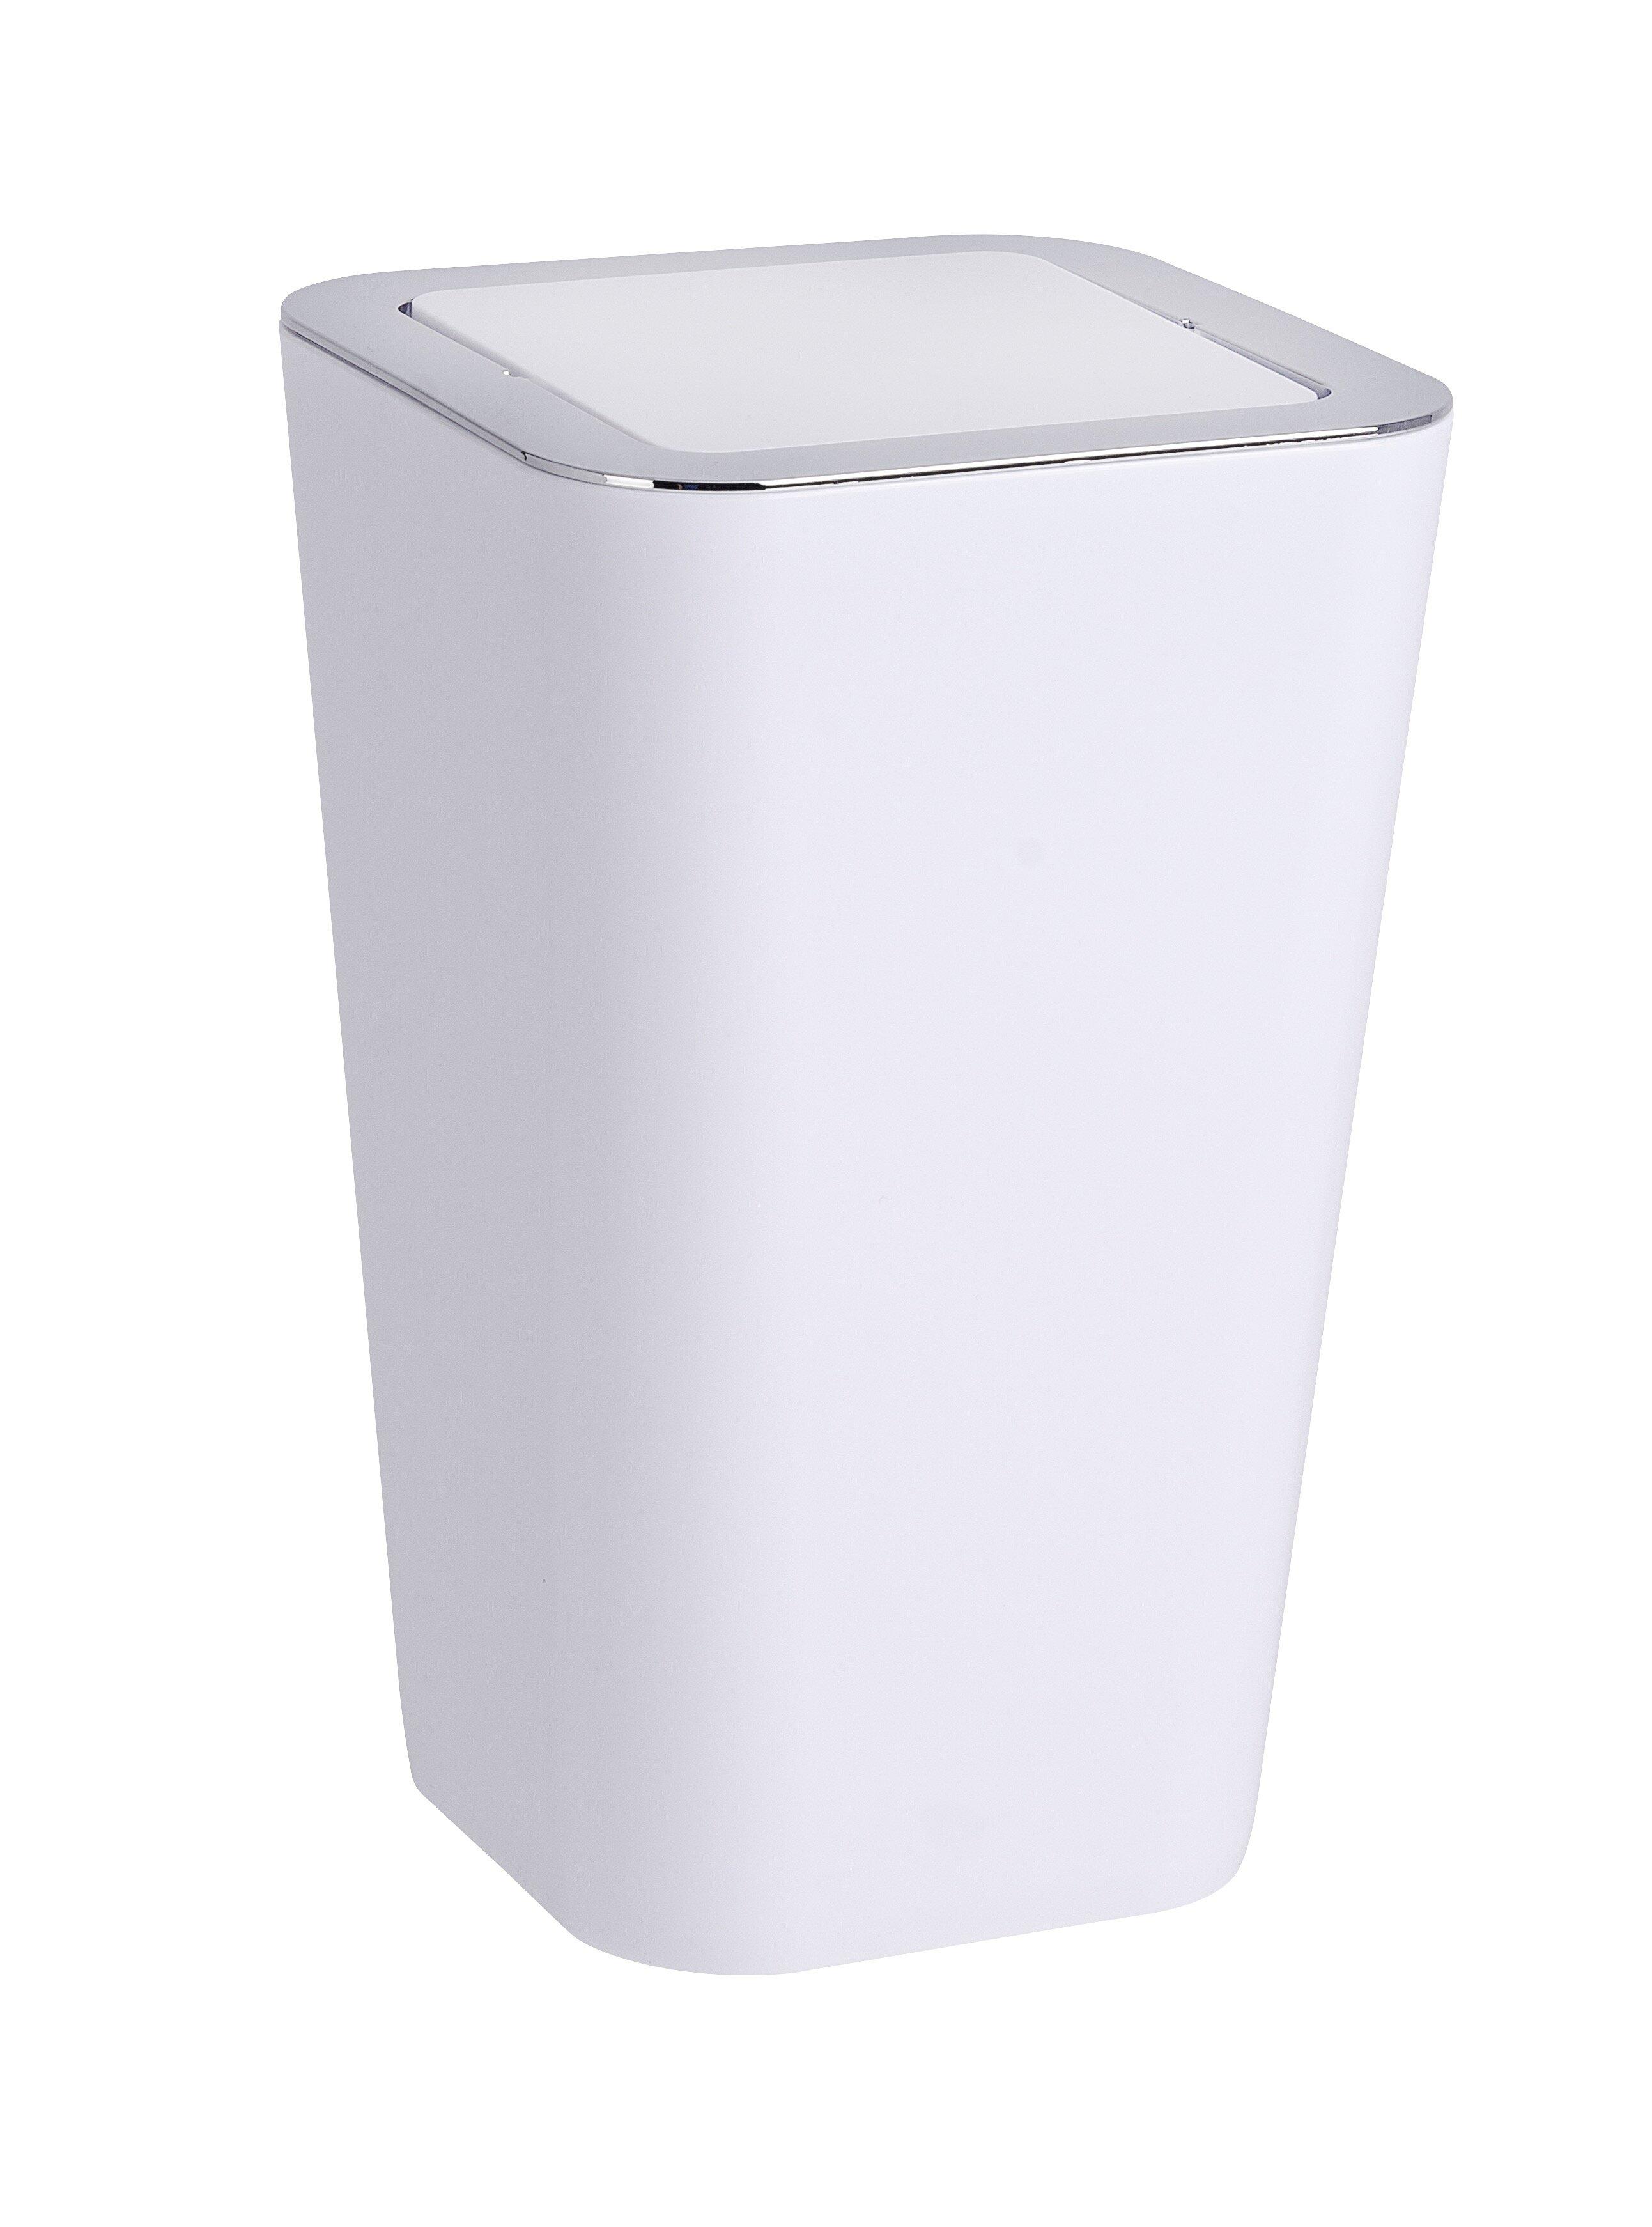 Wenko Inc Candy Swing Top 1 5 Gallon Trash Can Reviews Wayfair